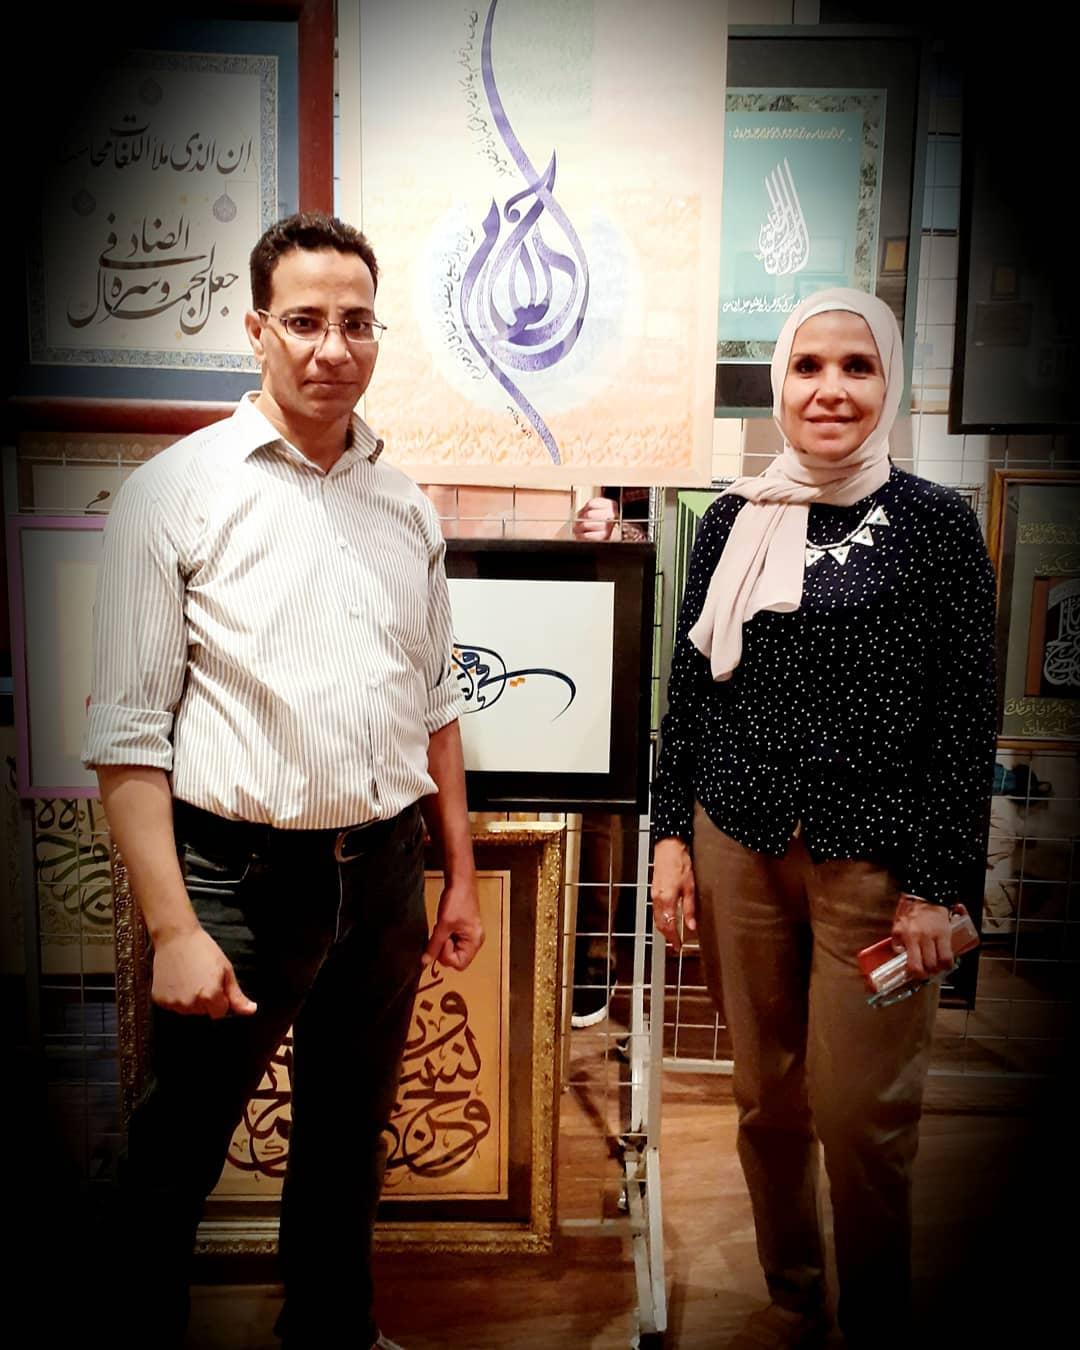 Karya Kaligrafi مع الفنانة التشكيلية المتميزة وأيكونة الطاقة الإيجابية Nagat Farouk @nagat_farou…- H Mokhtar